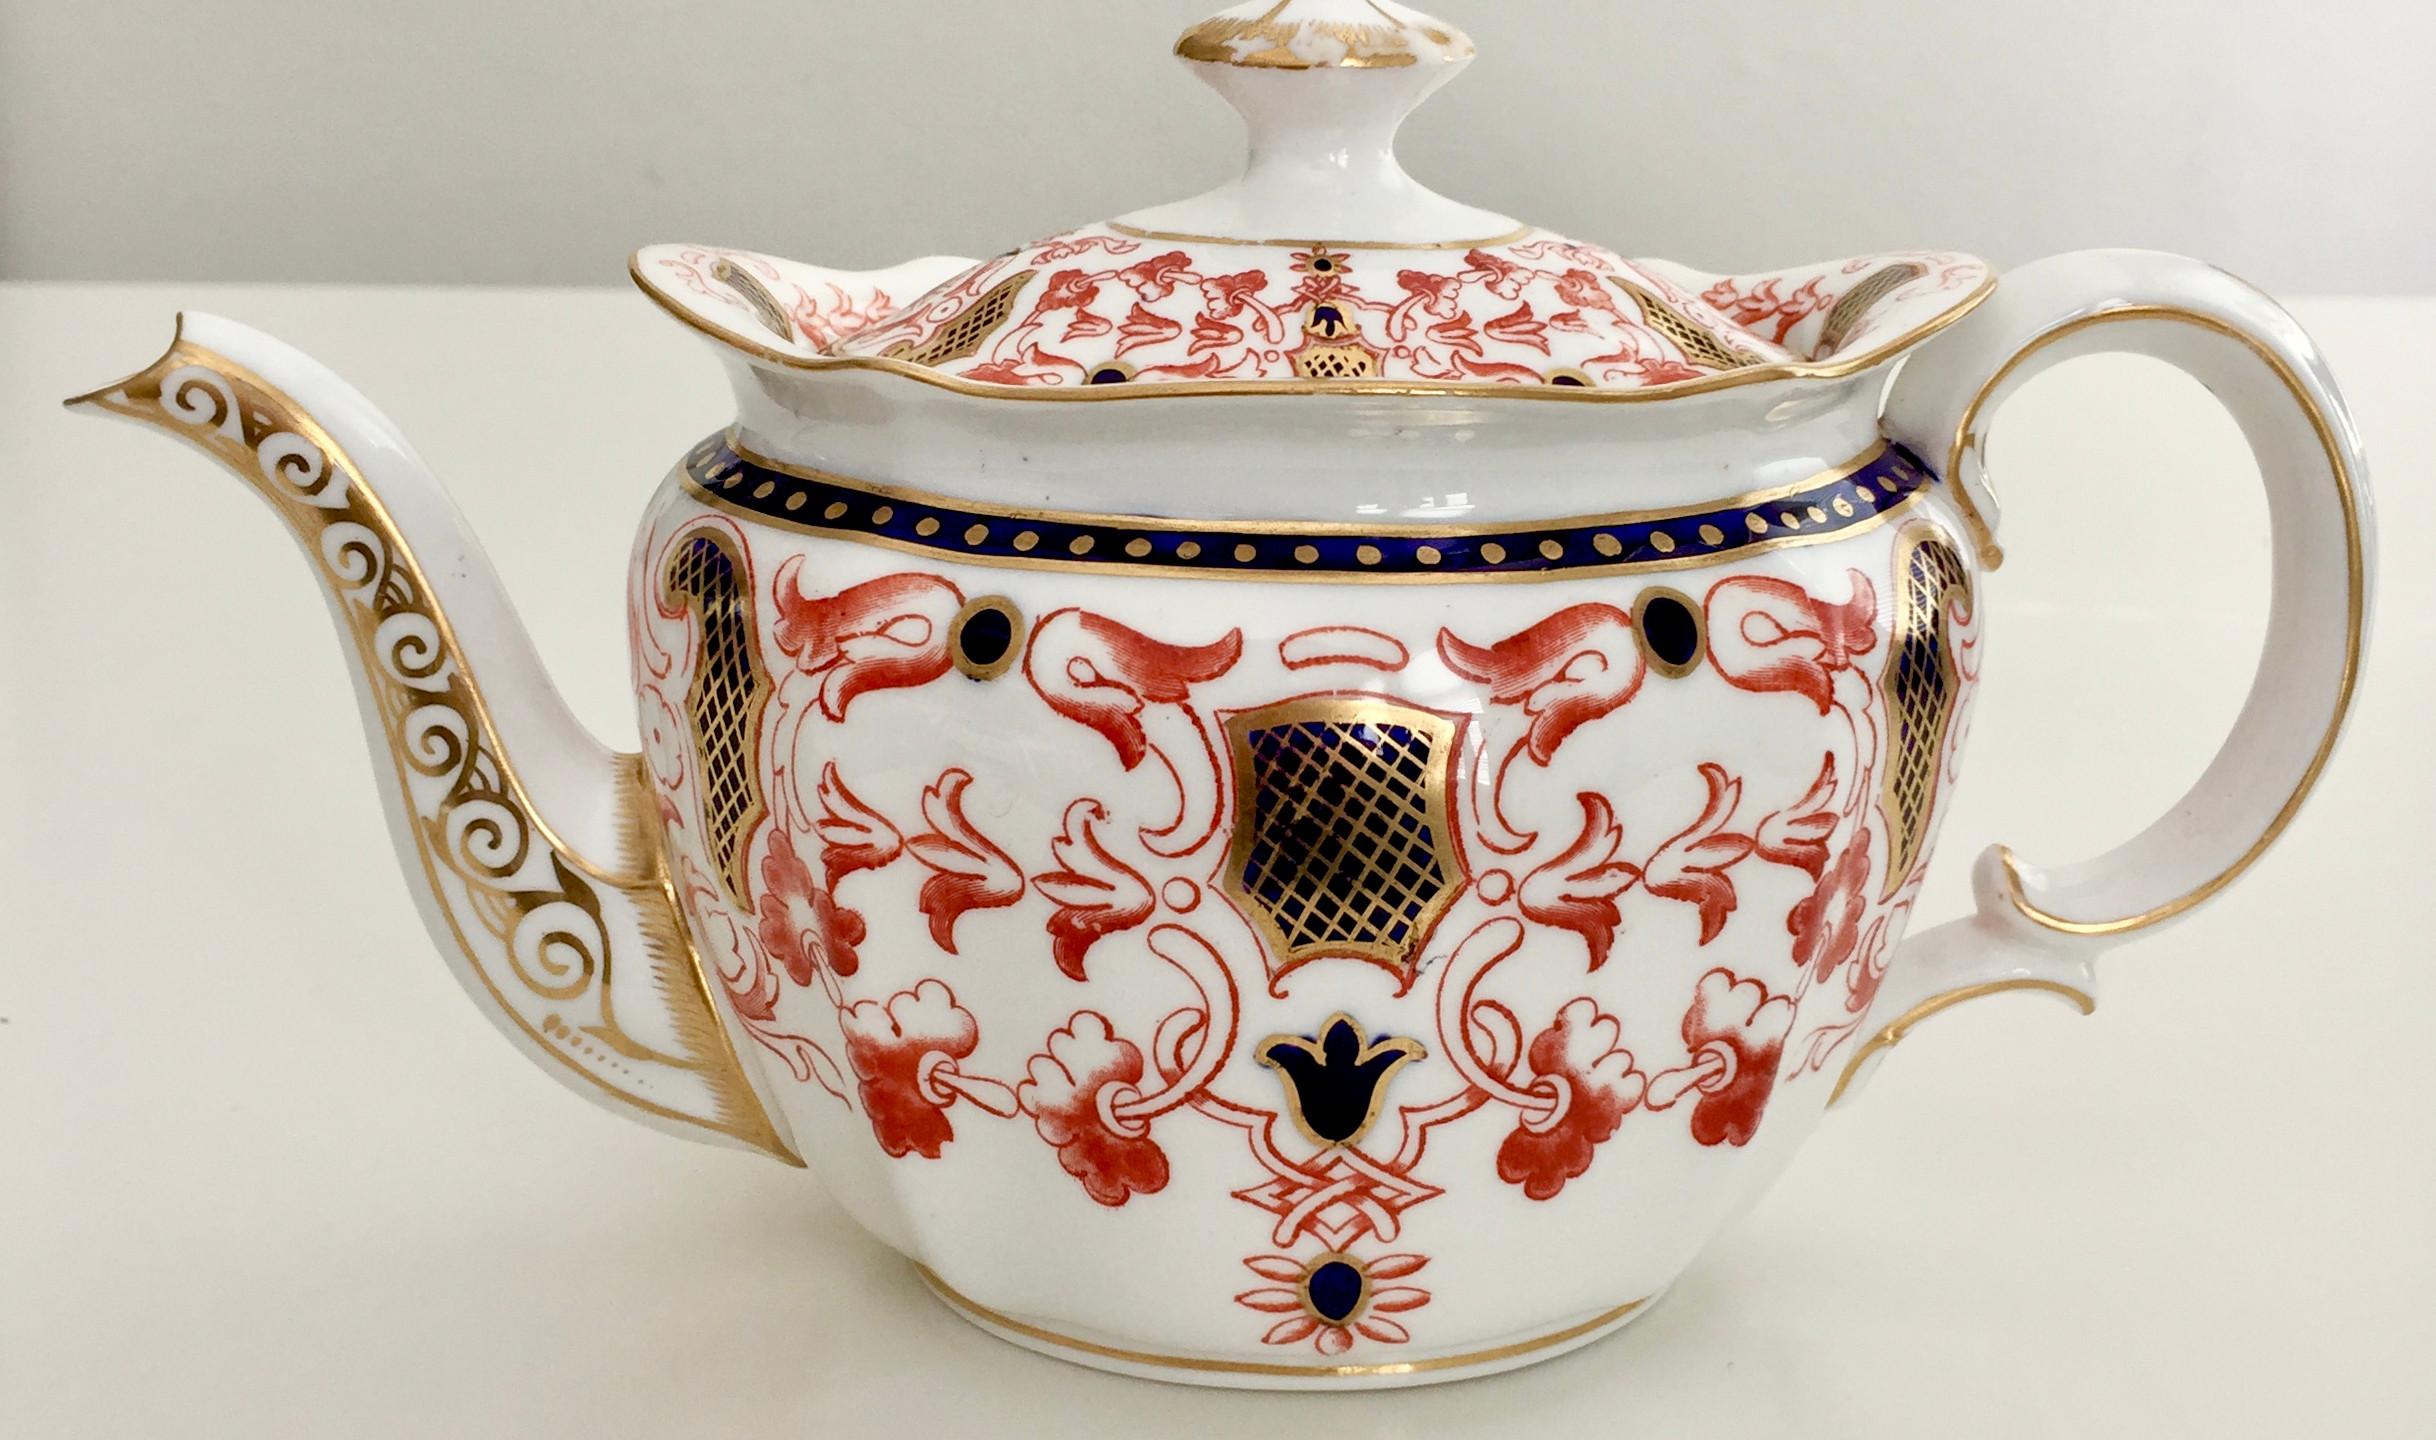 Royal Crown Derby tea service, 1899